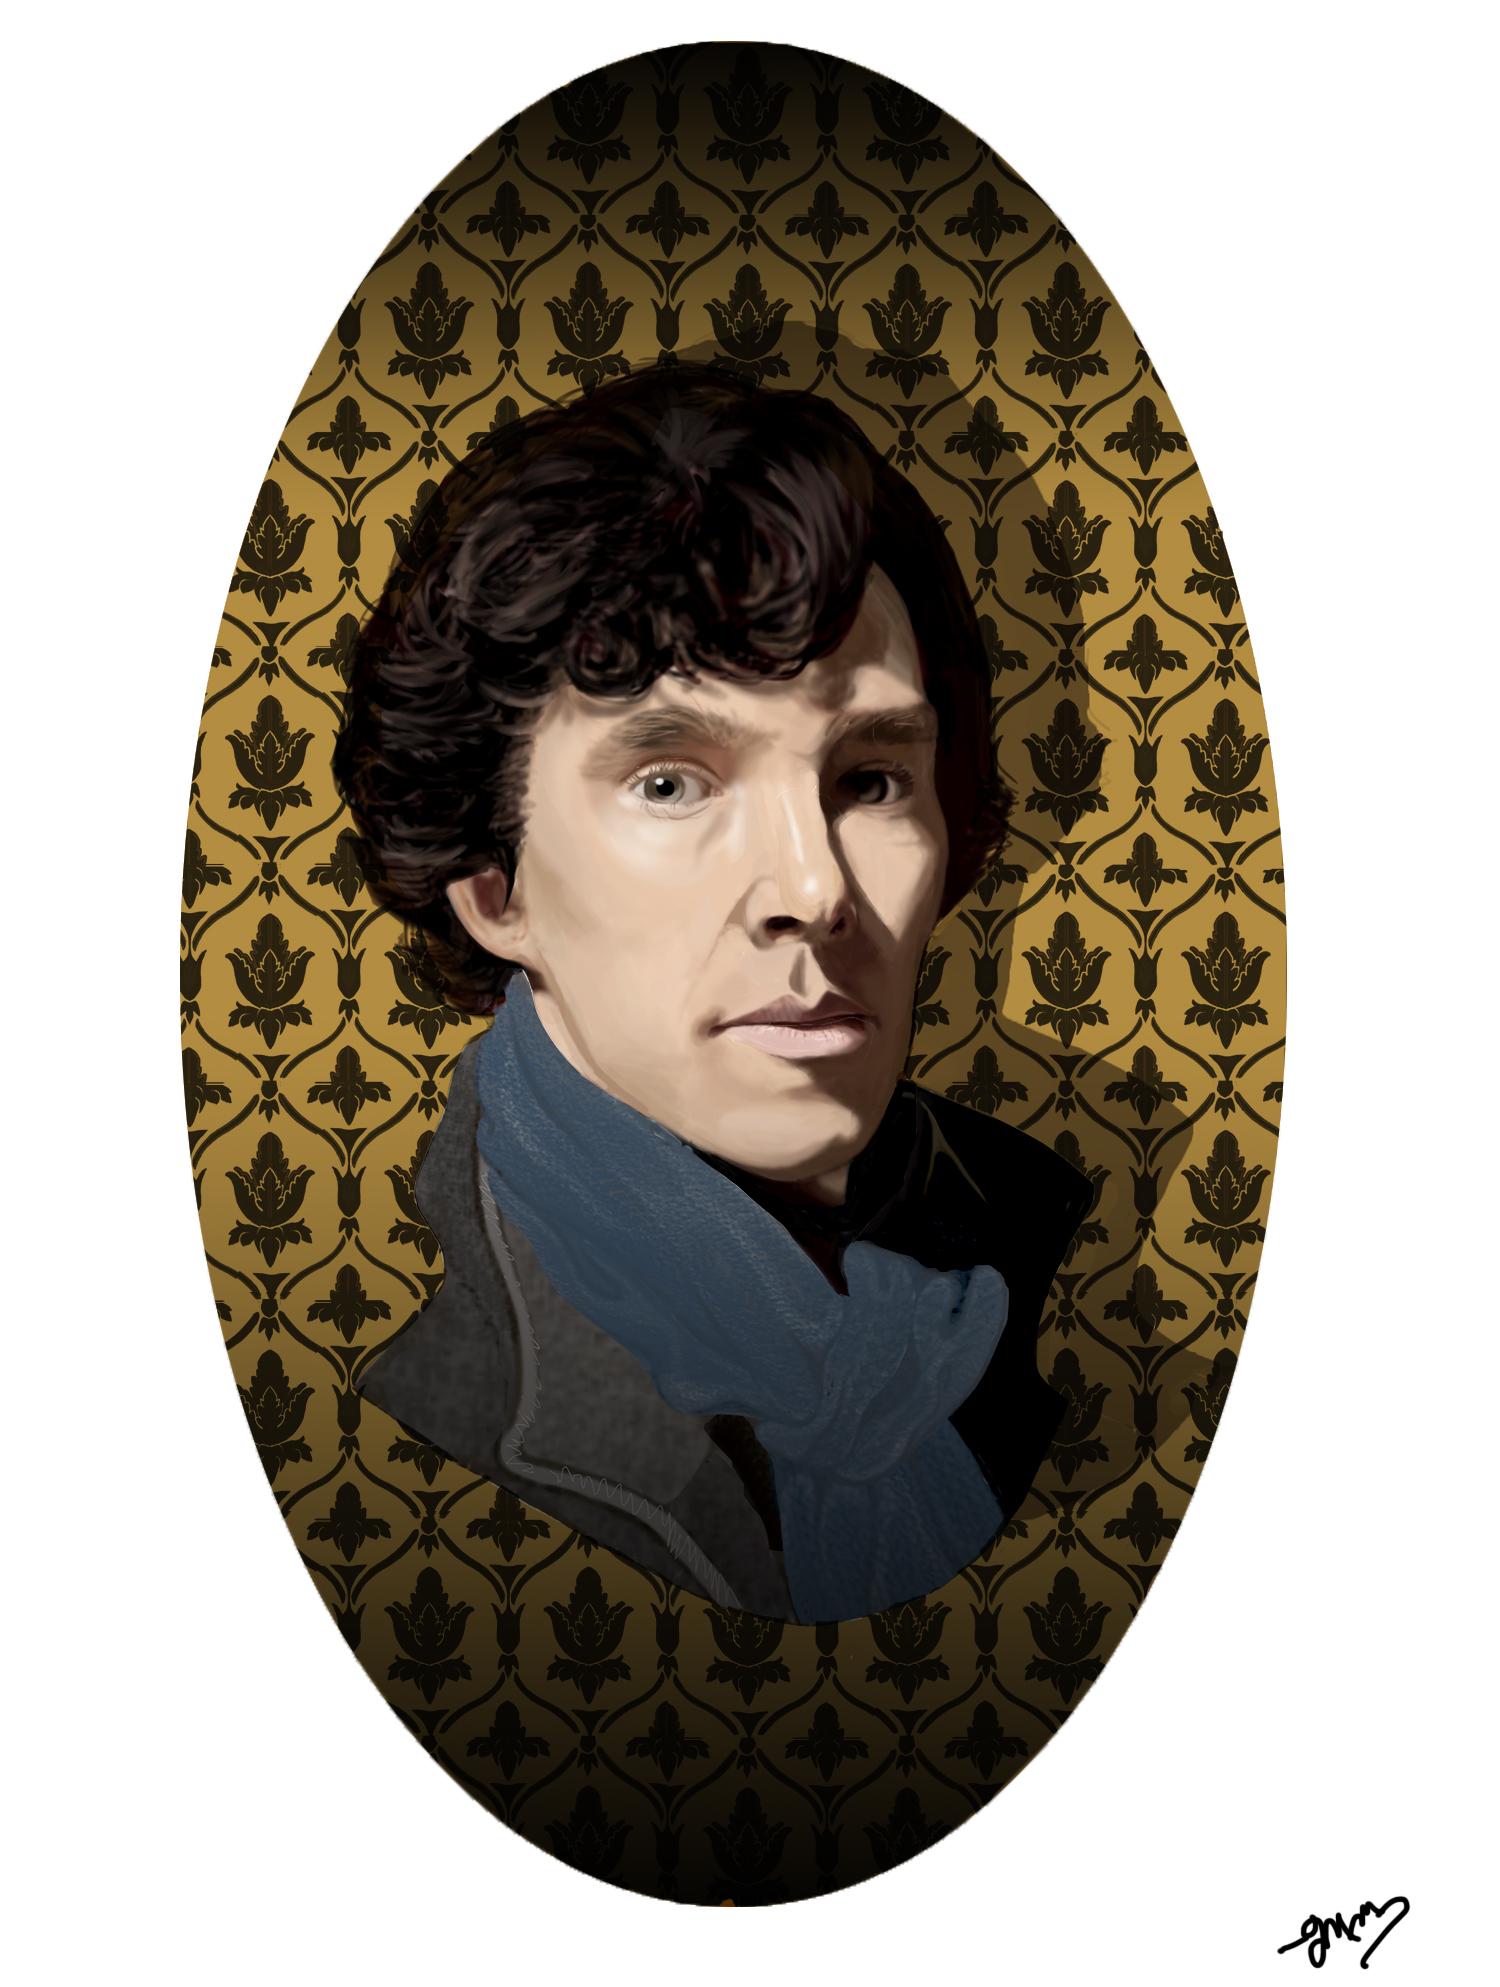 Sherlock Holmes by MickEMac